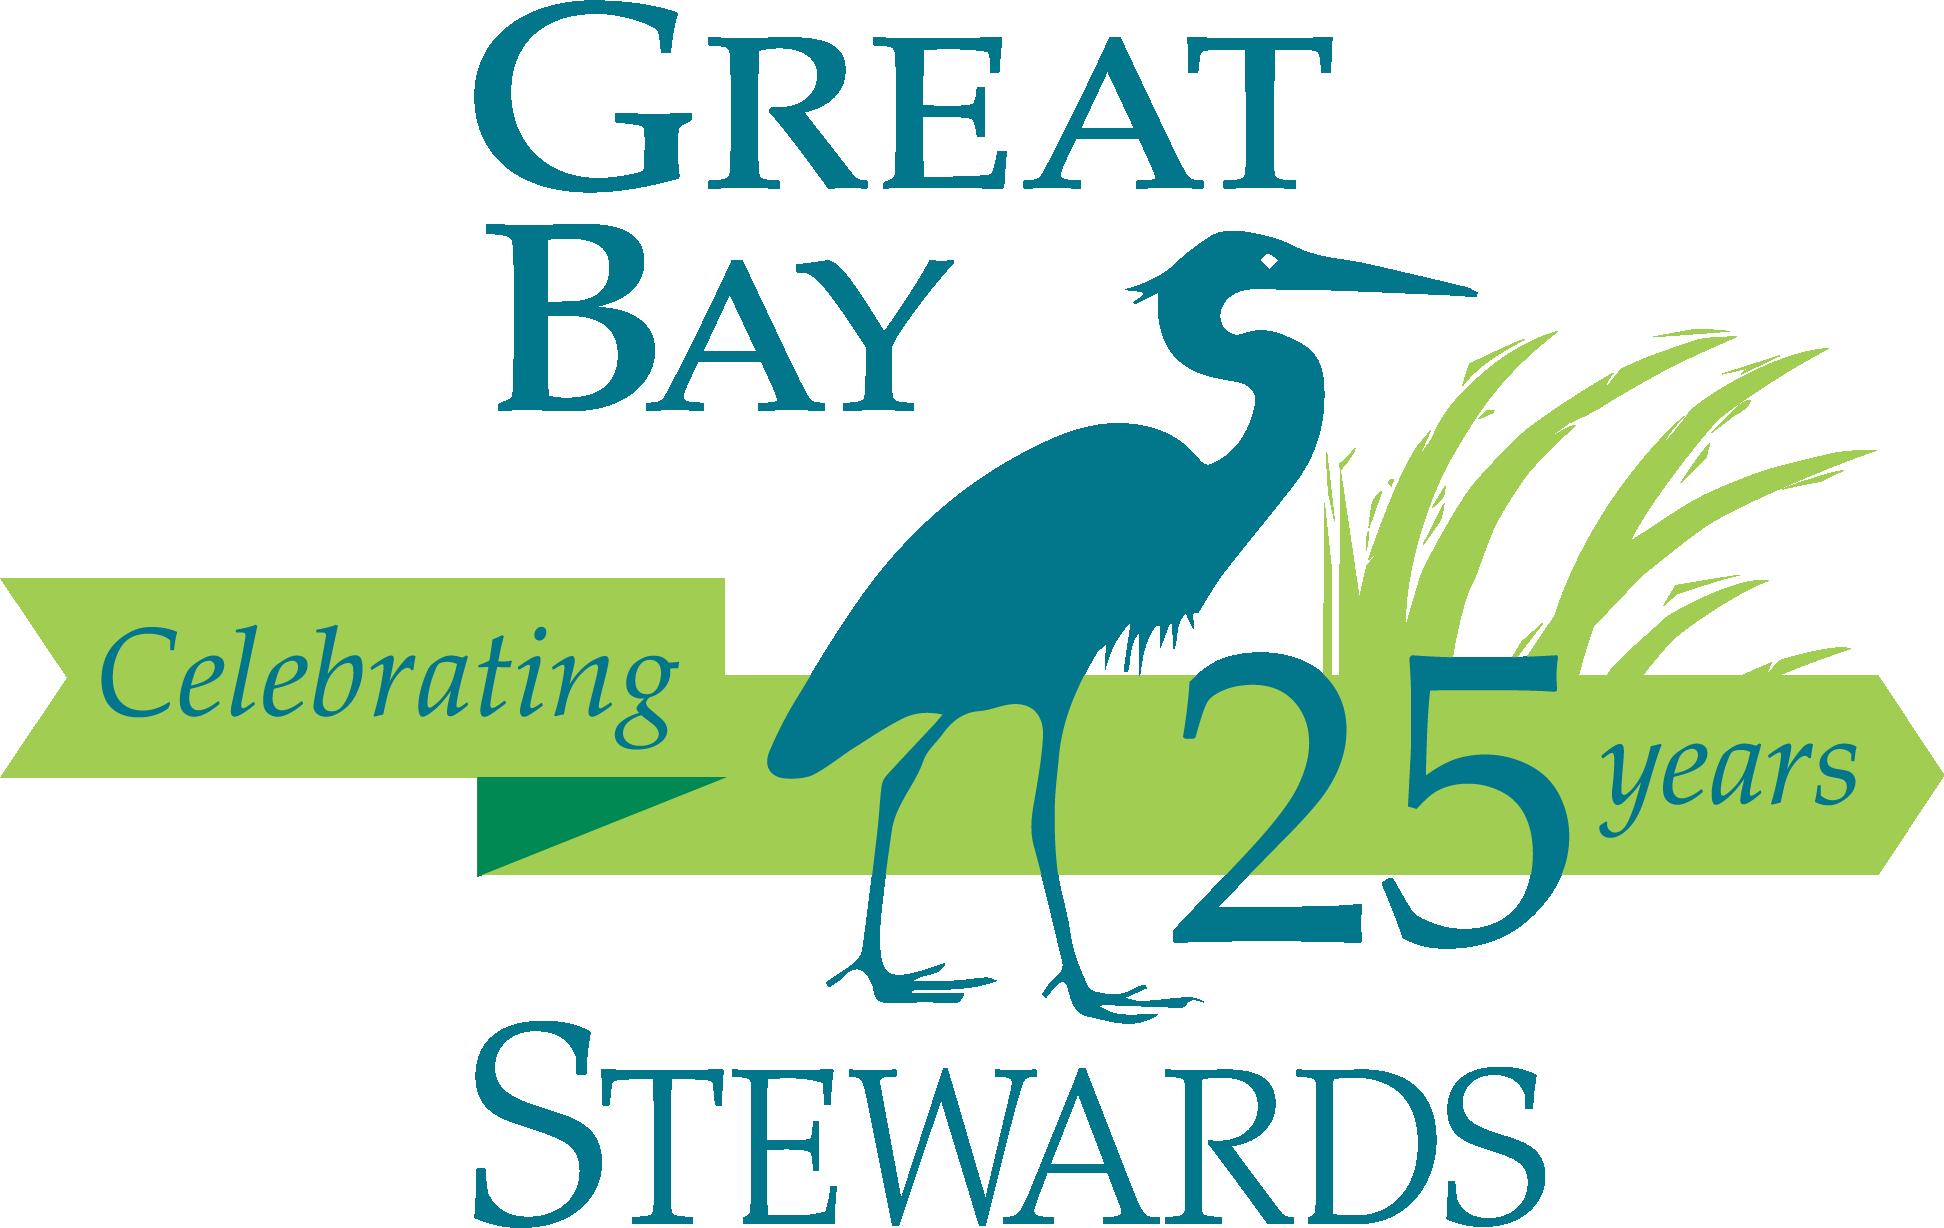 Great Bay 5K